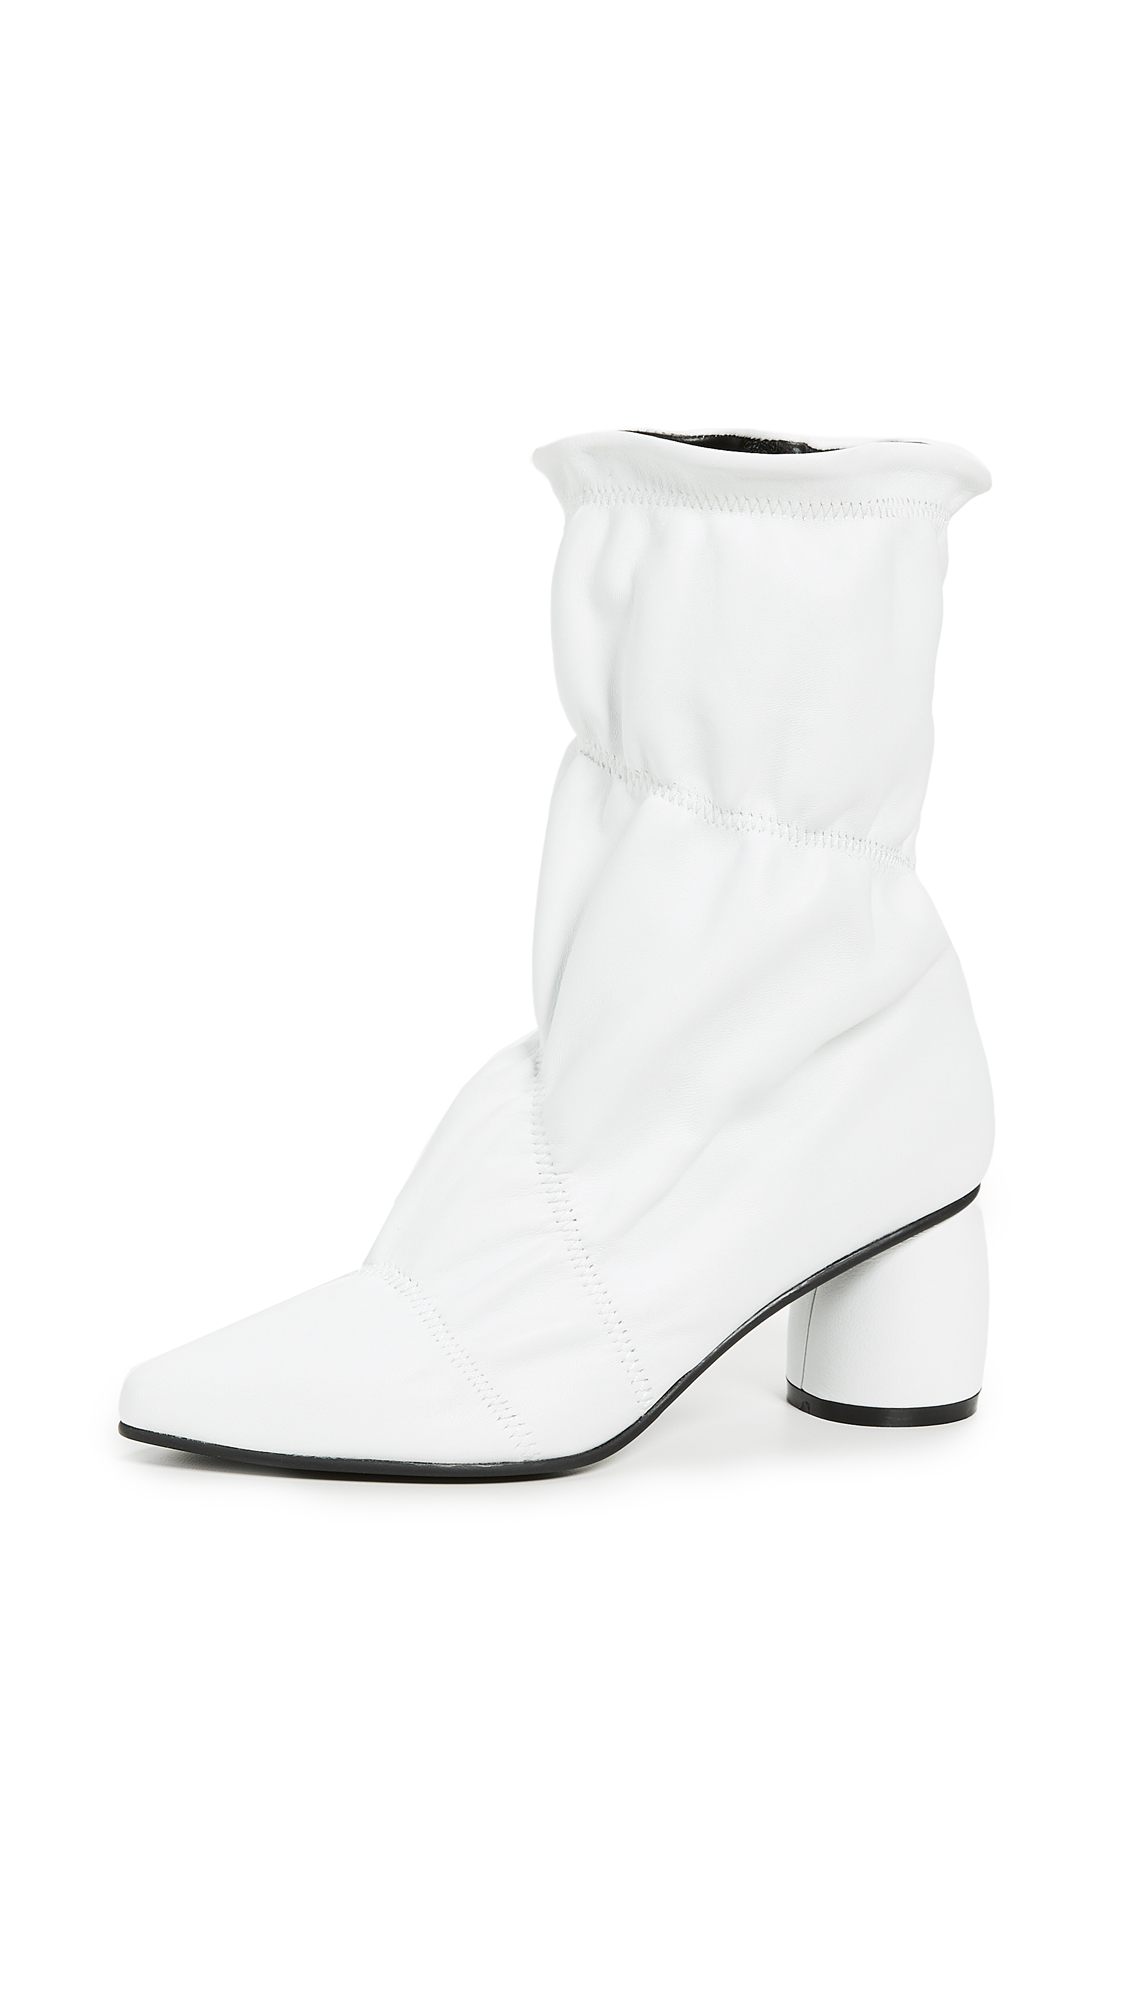 Reike Nen Parachute Ankle Boots - White